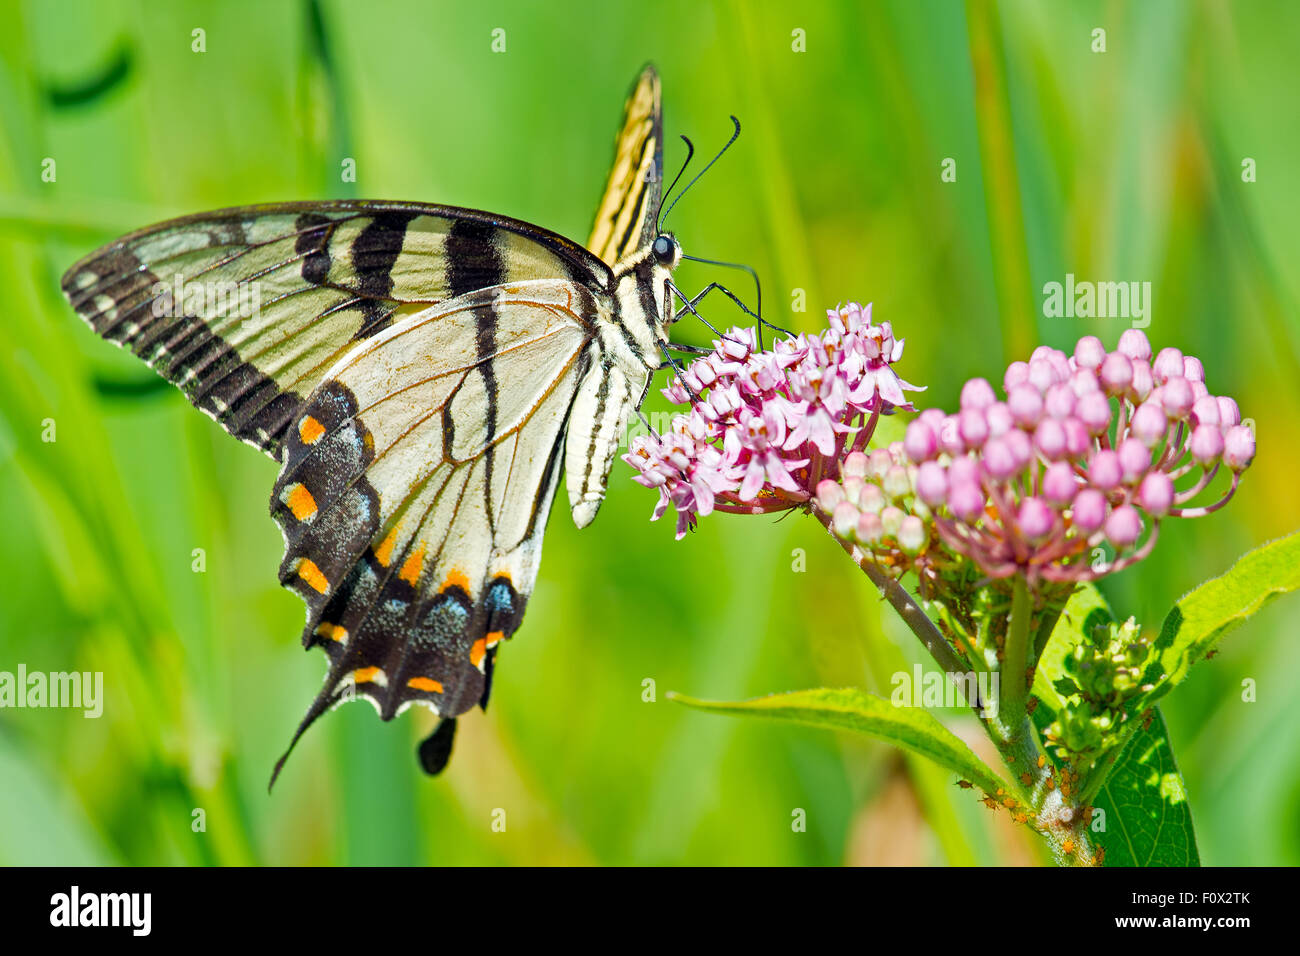 Tiger Swallowtail Butterfly se nourrissant de fleurs Photo Stock